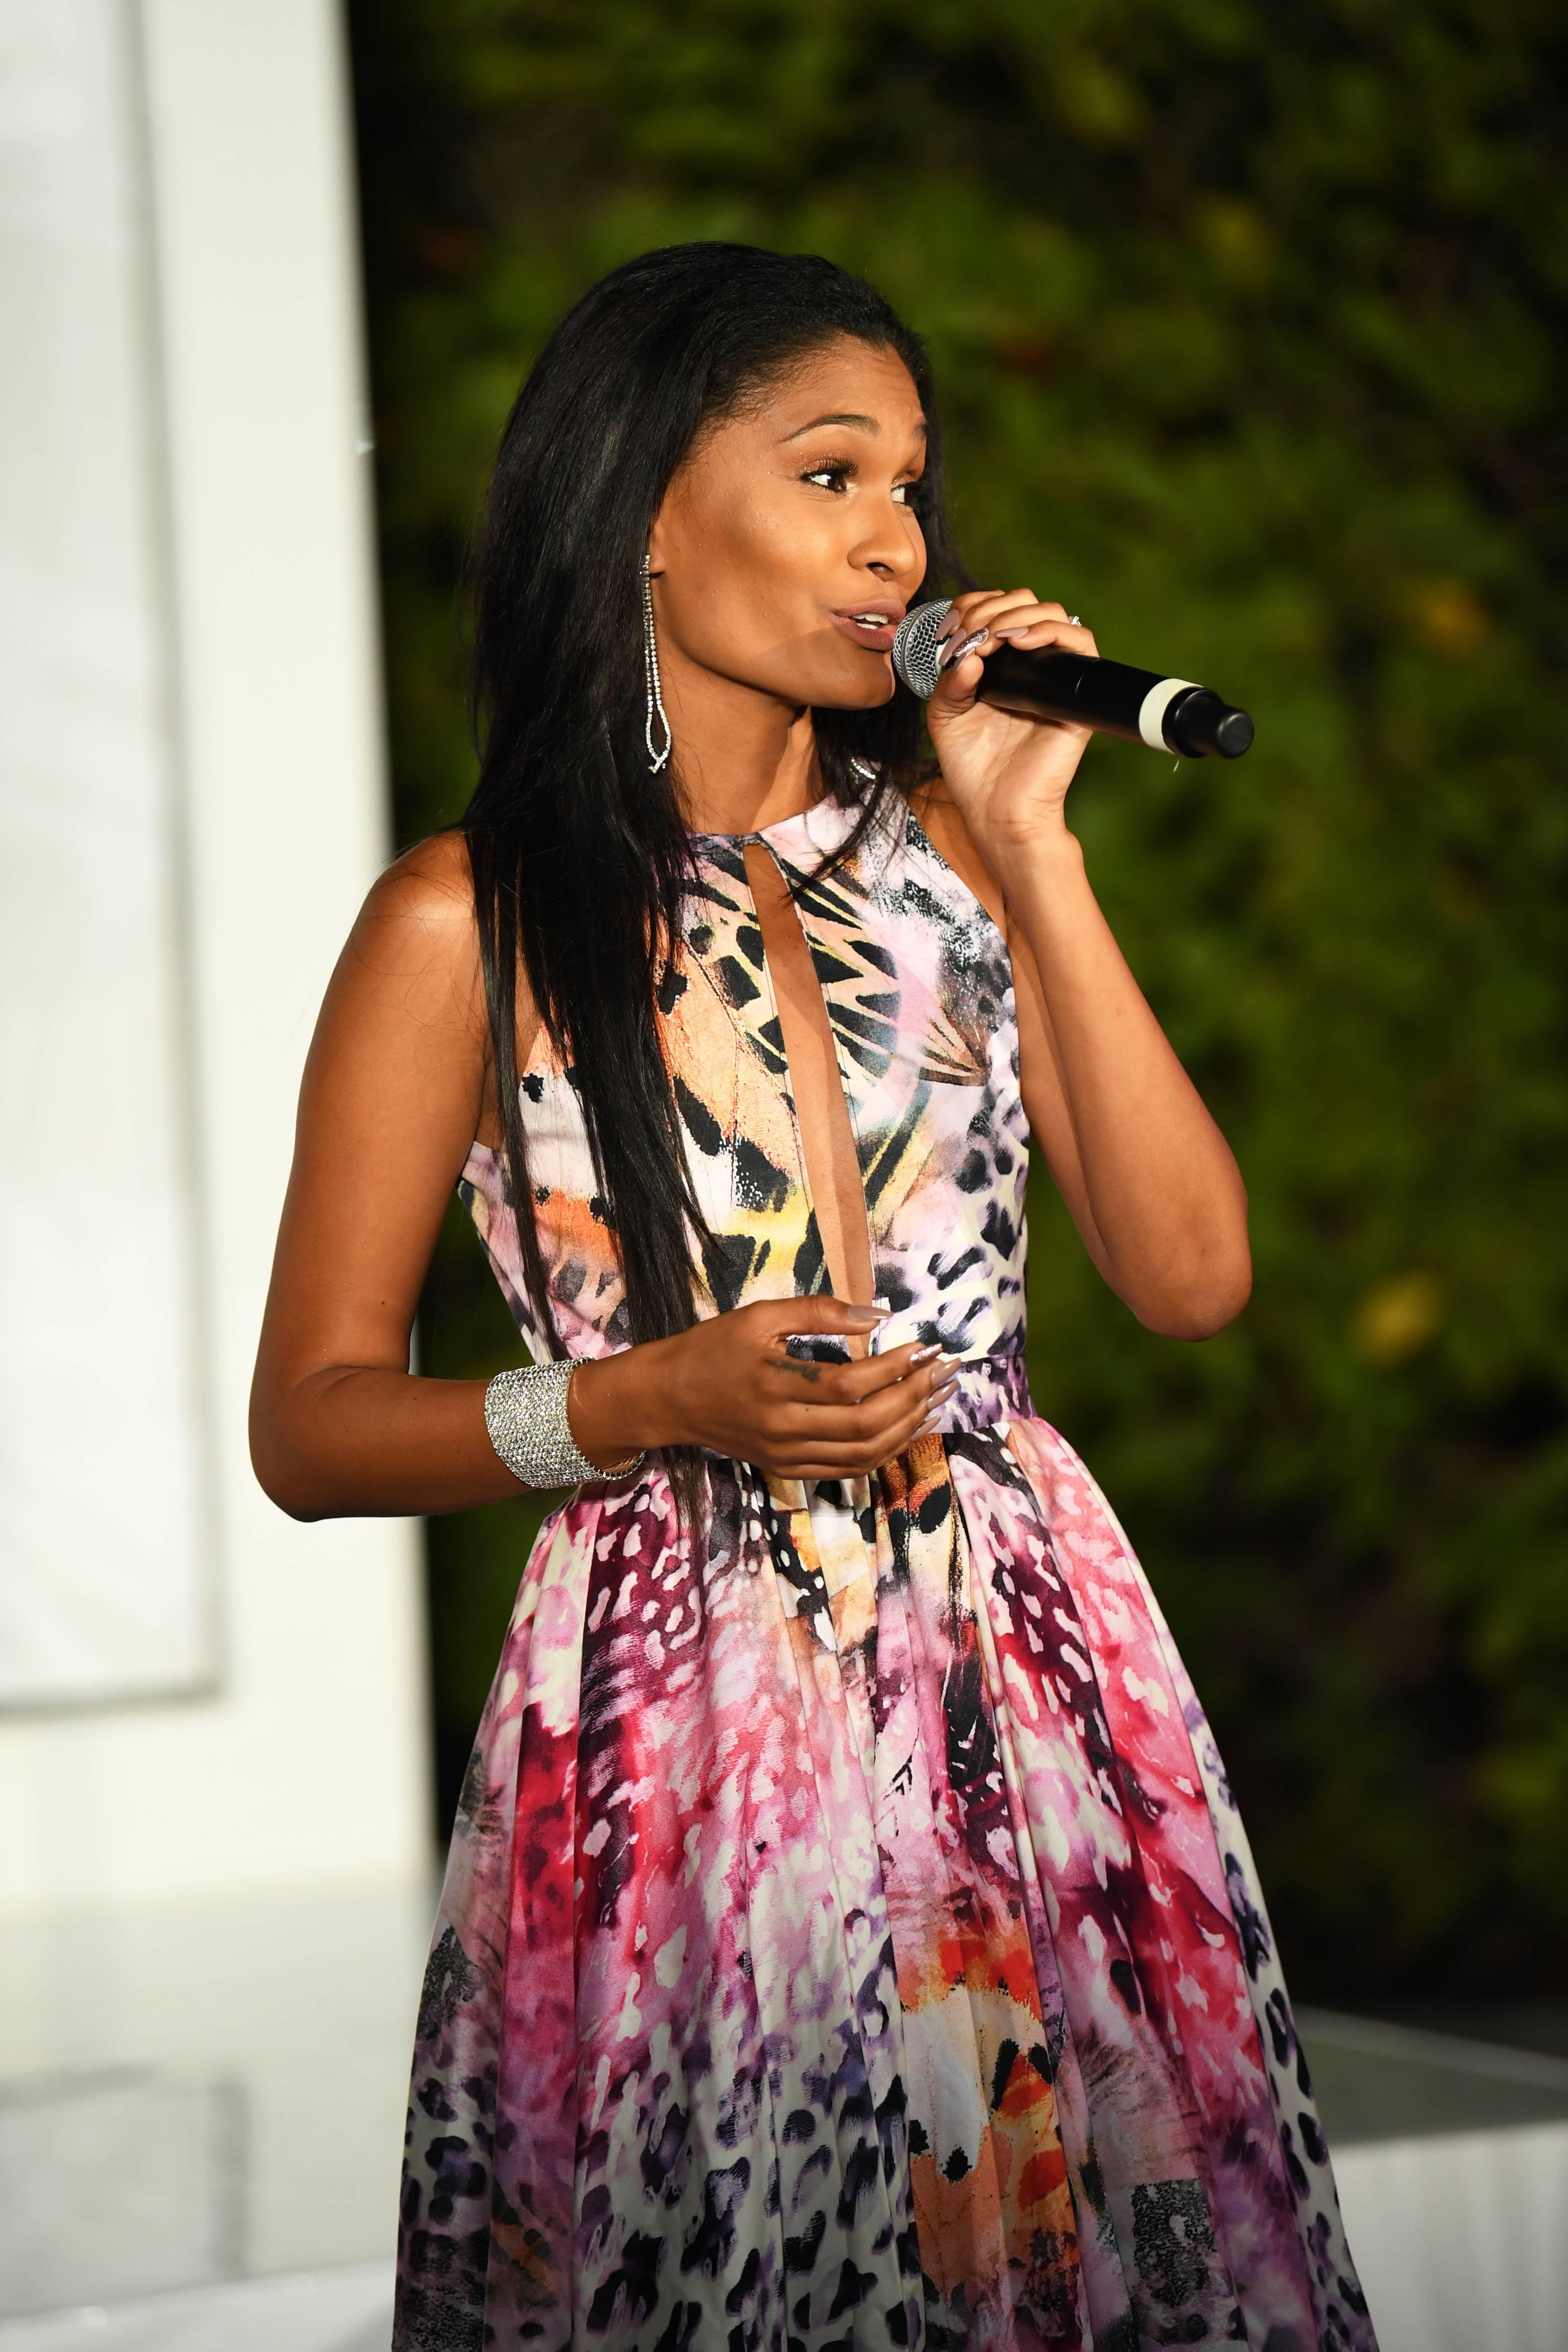 Arita Edmund - Wise words were spoken by Trinidad and Tobago's most promising singing sensation.(Photo: Phelan Marc/BET)